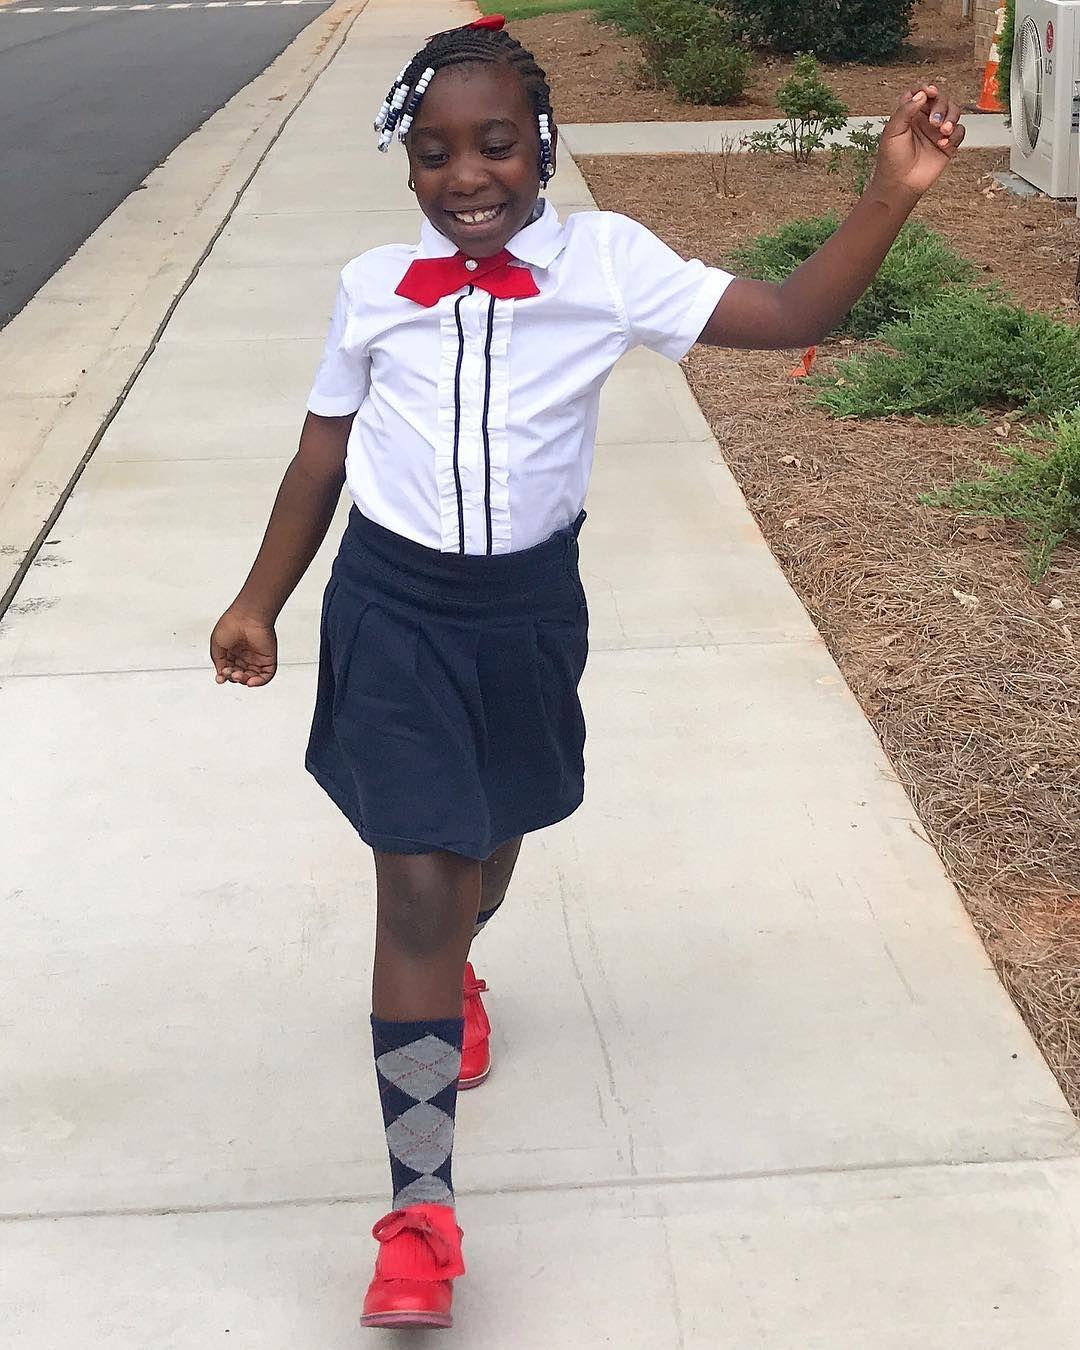 Pin On Girls In Uniforms